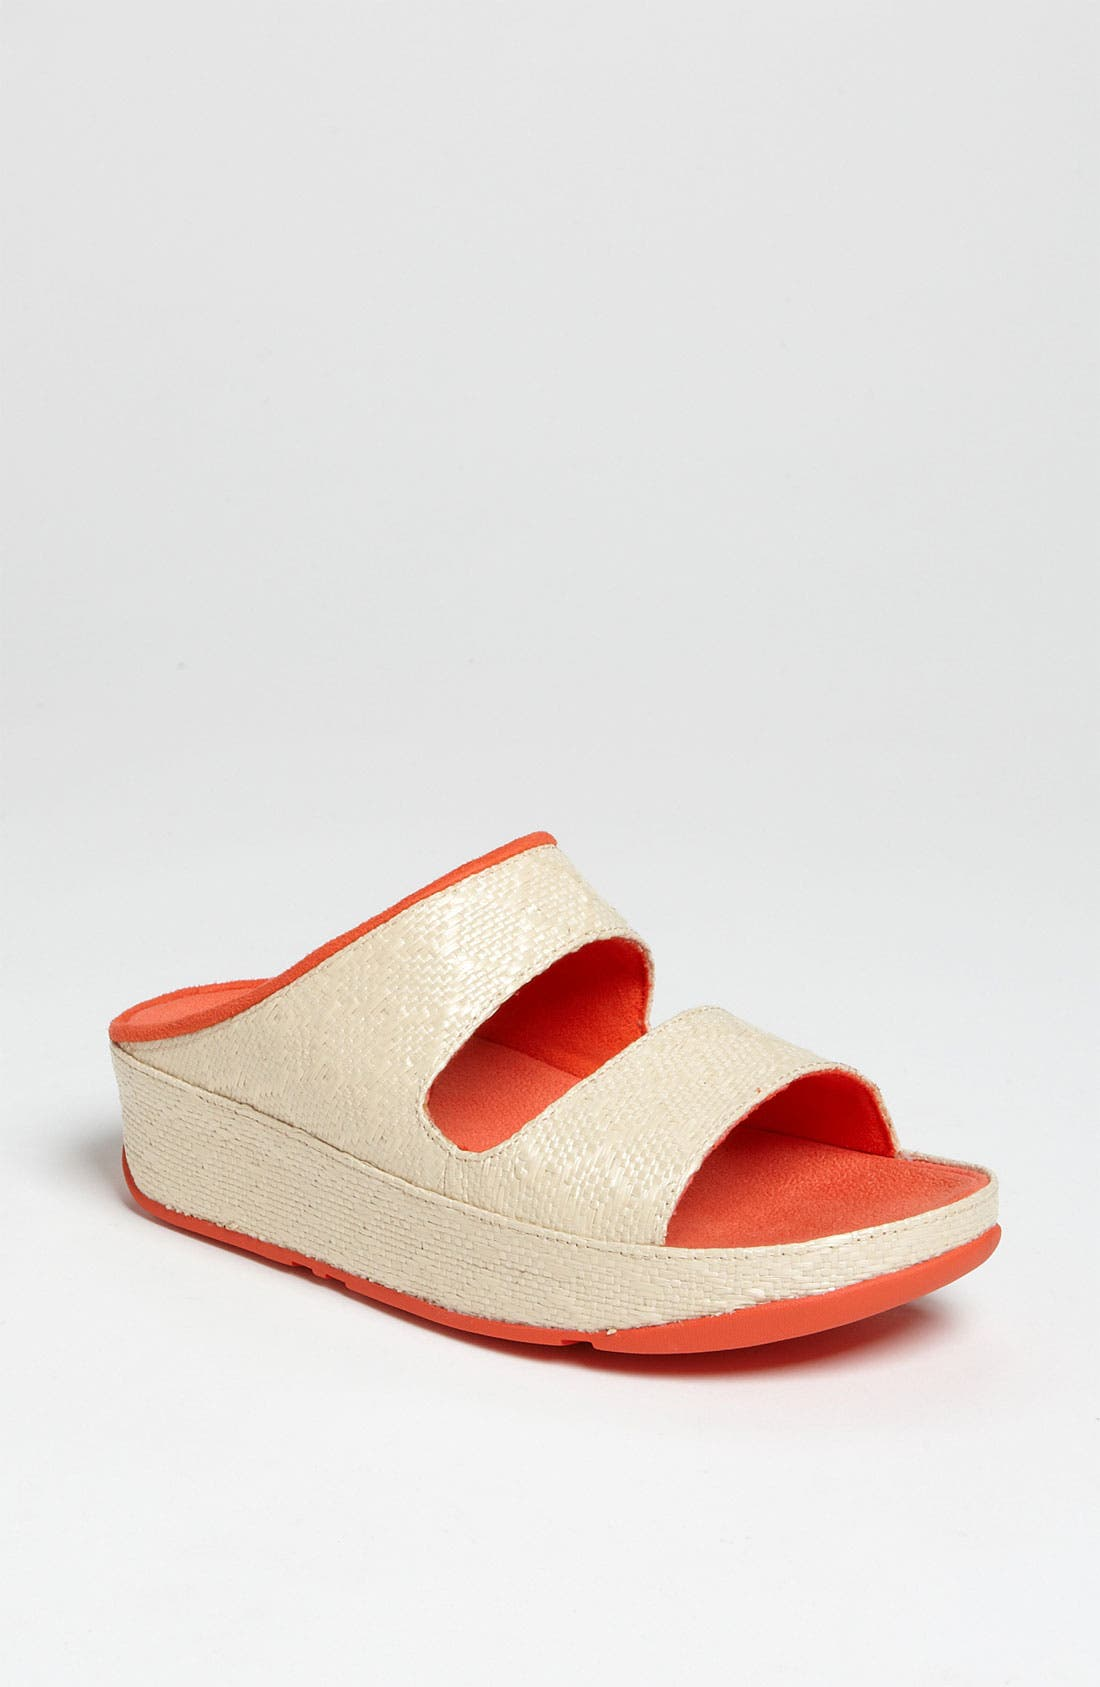 Alternate Image 1 Selected - FitFlop 'Lolla Raffia' Sandal